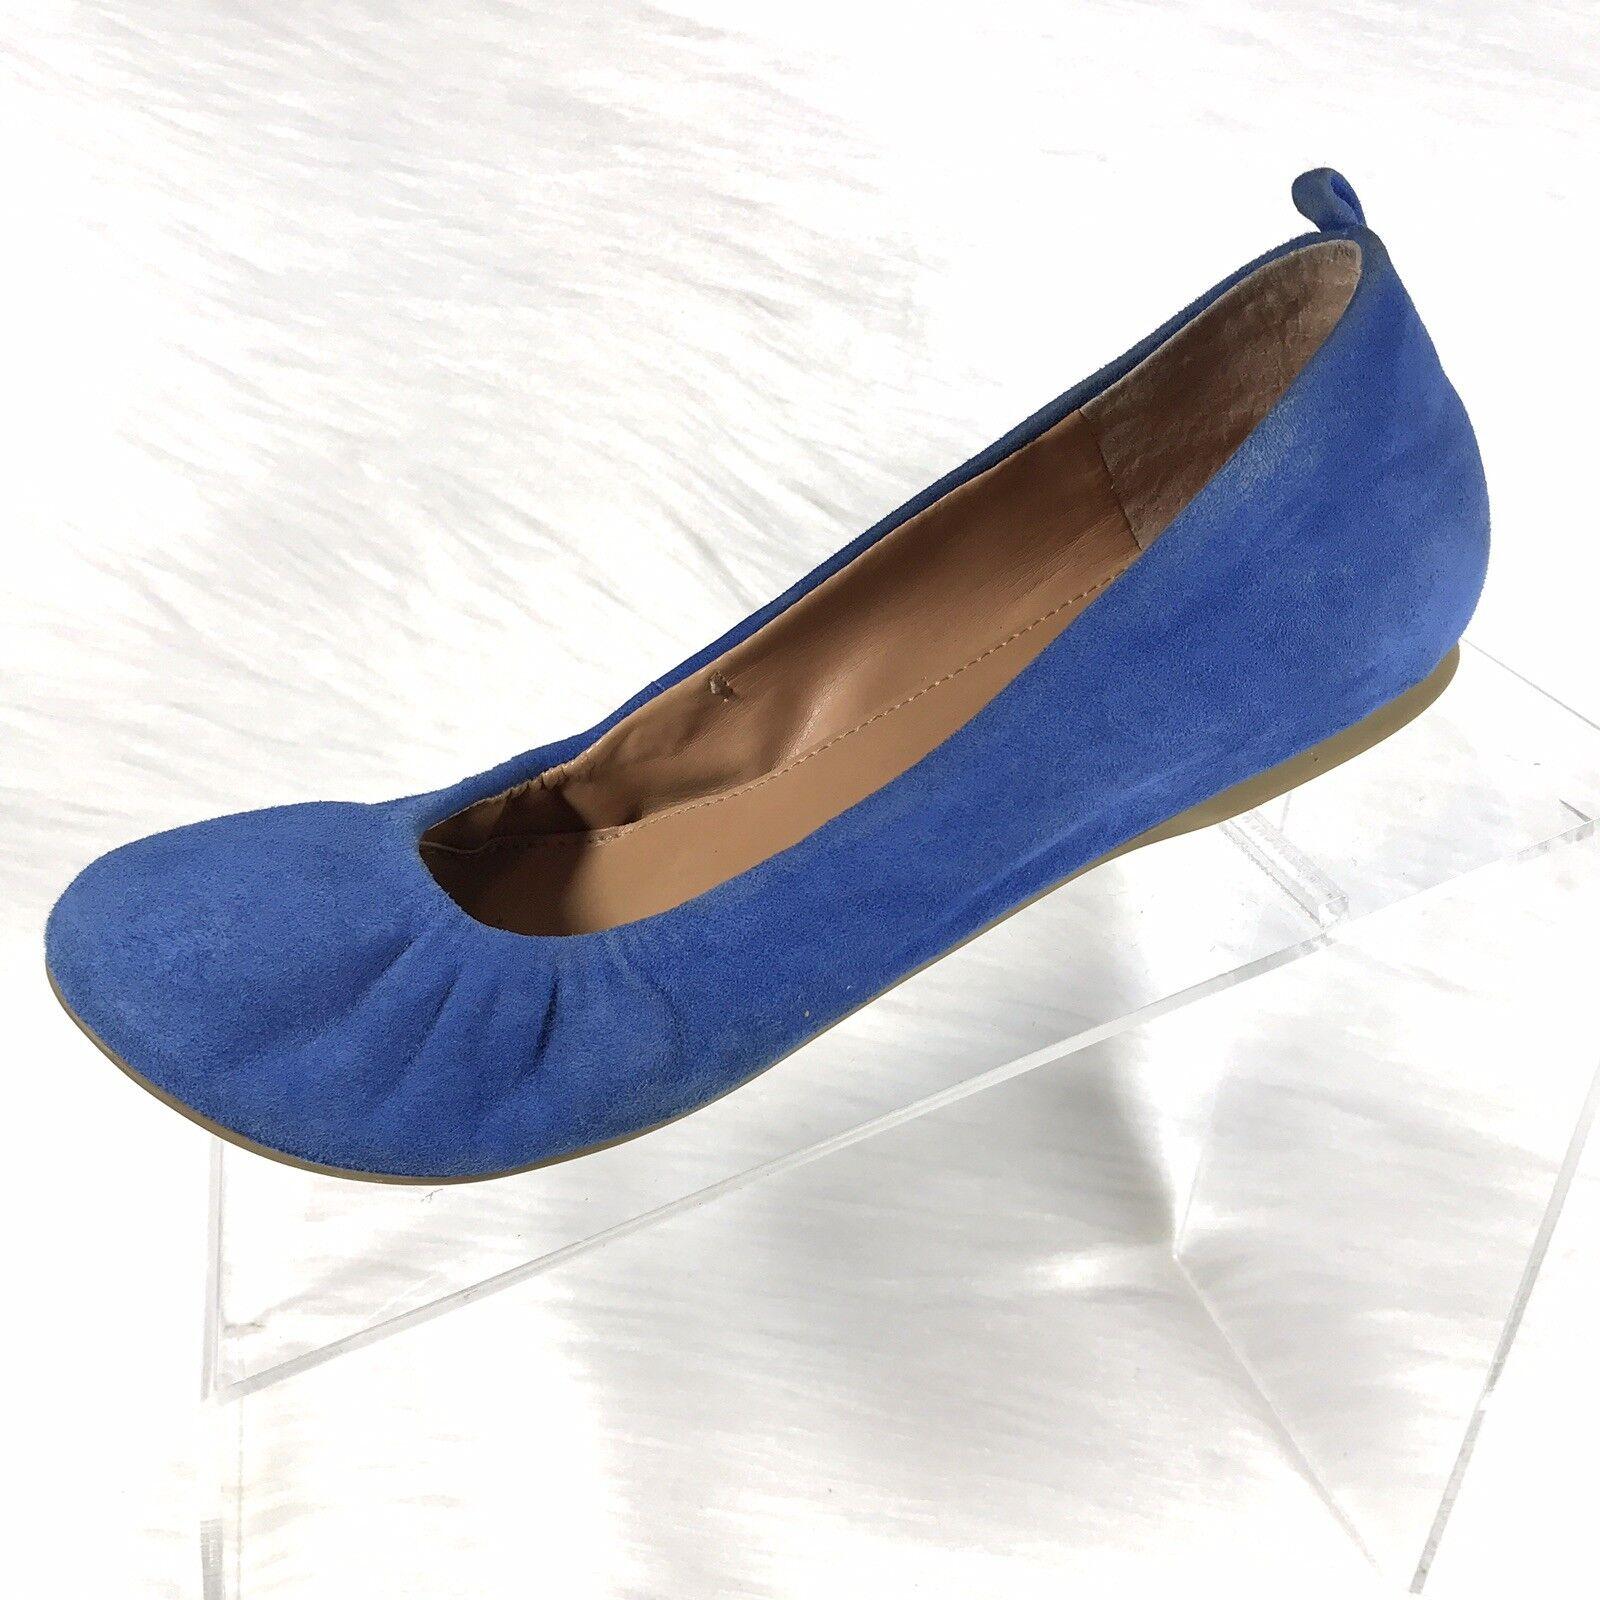 J Crew Cece Women's Ballet Flats bluee Suede size 6.5